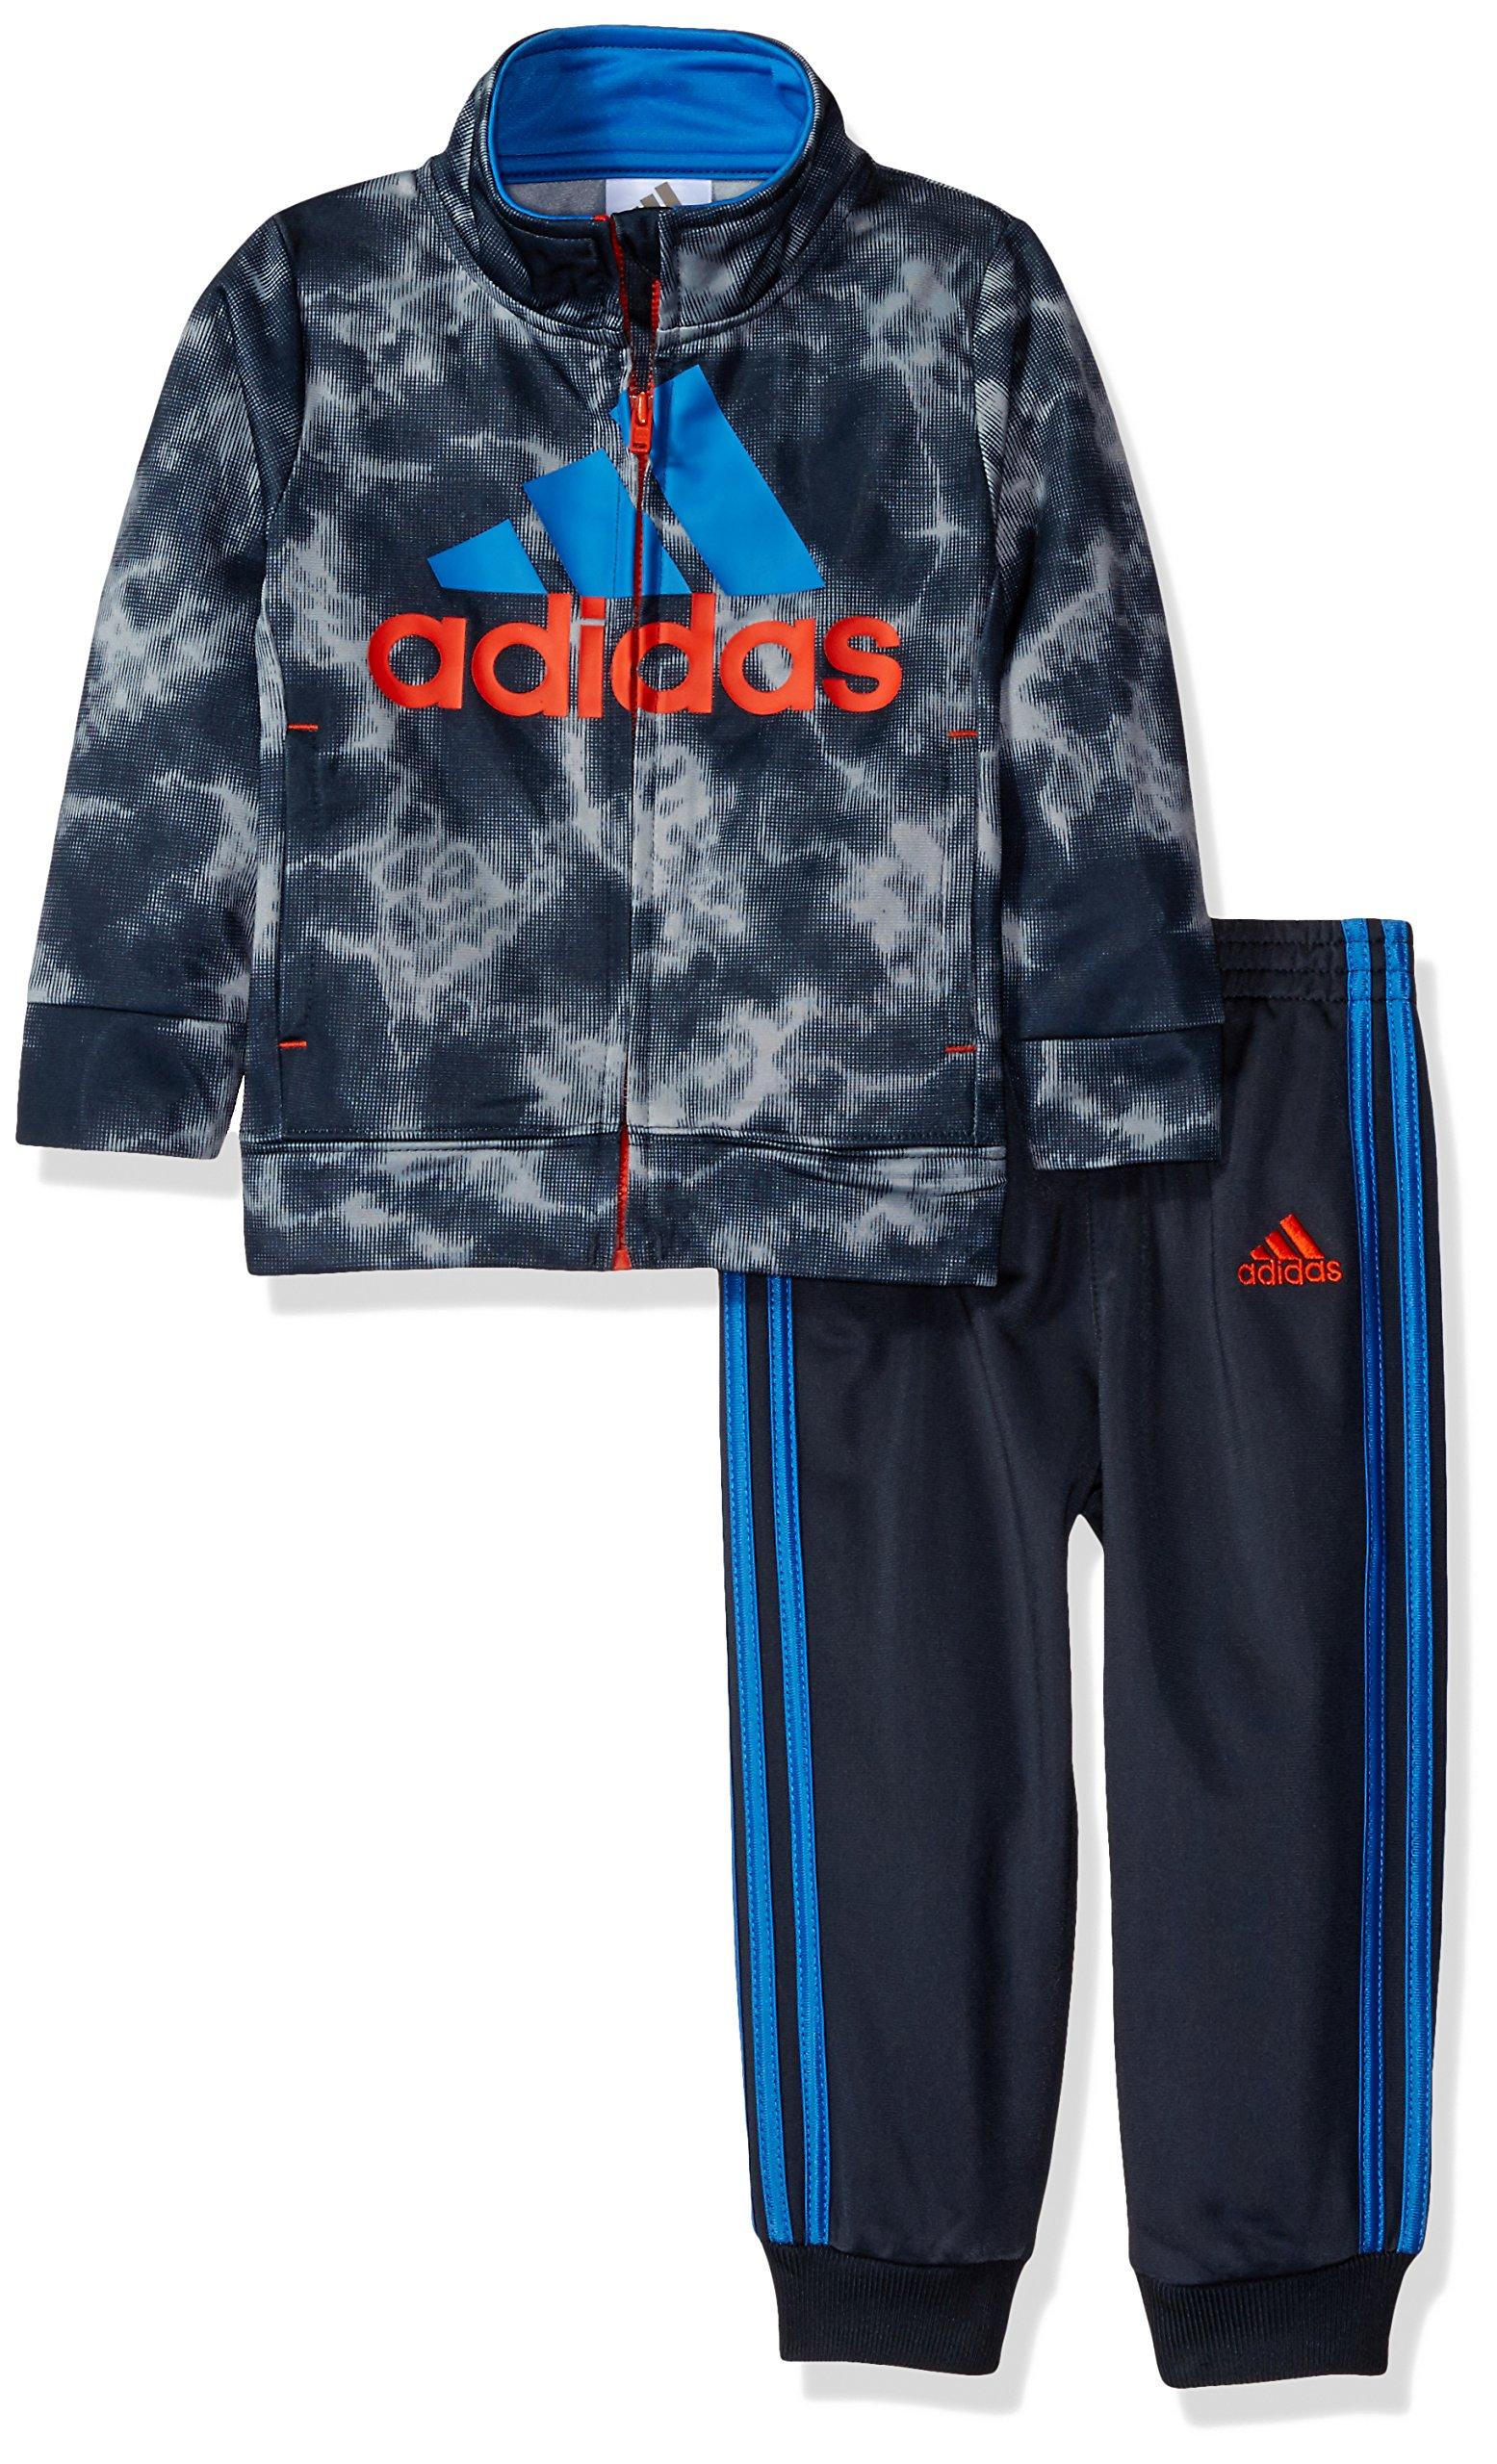 adidas Toddler Boys' Tricot Jacket and Pant Set, Dark Grey, 2T